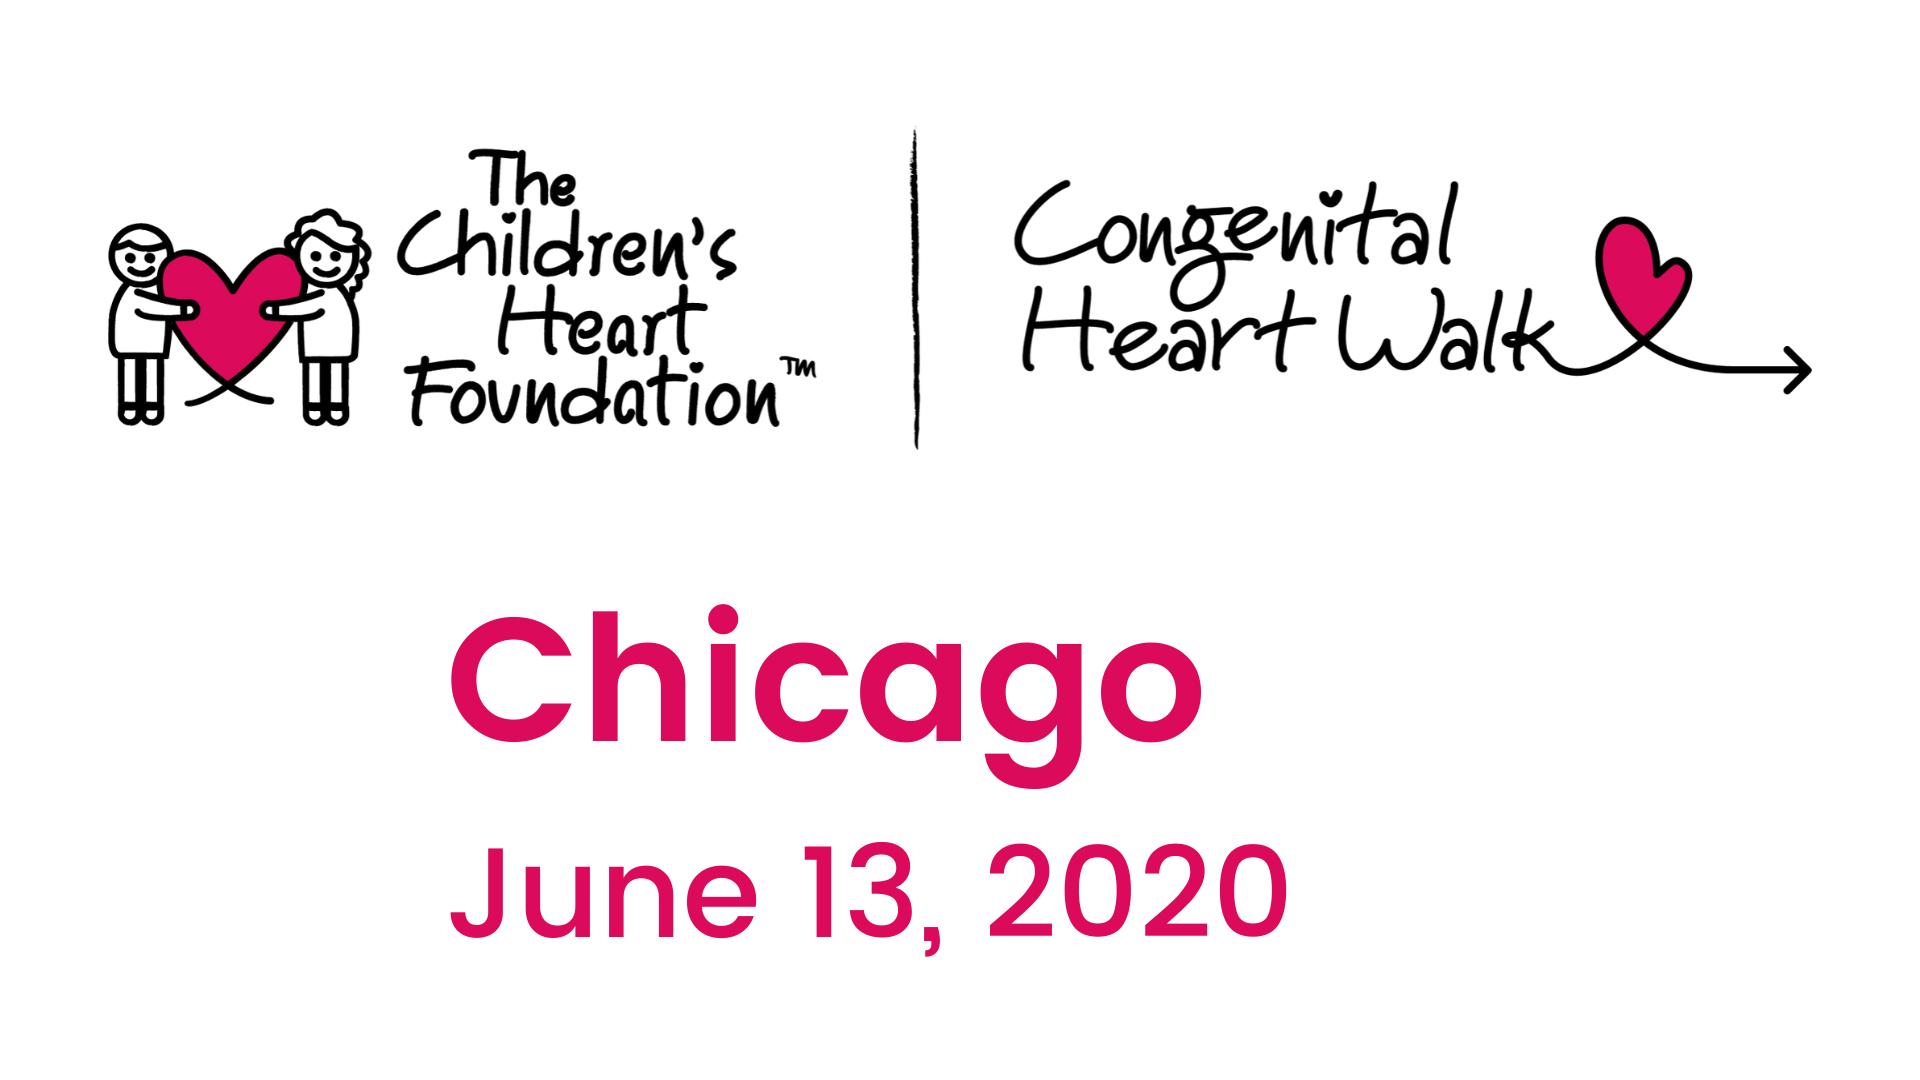 Chicago Congenital Heart Walk (Illinois)